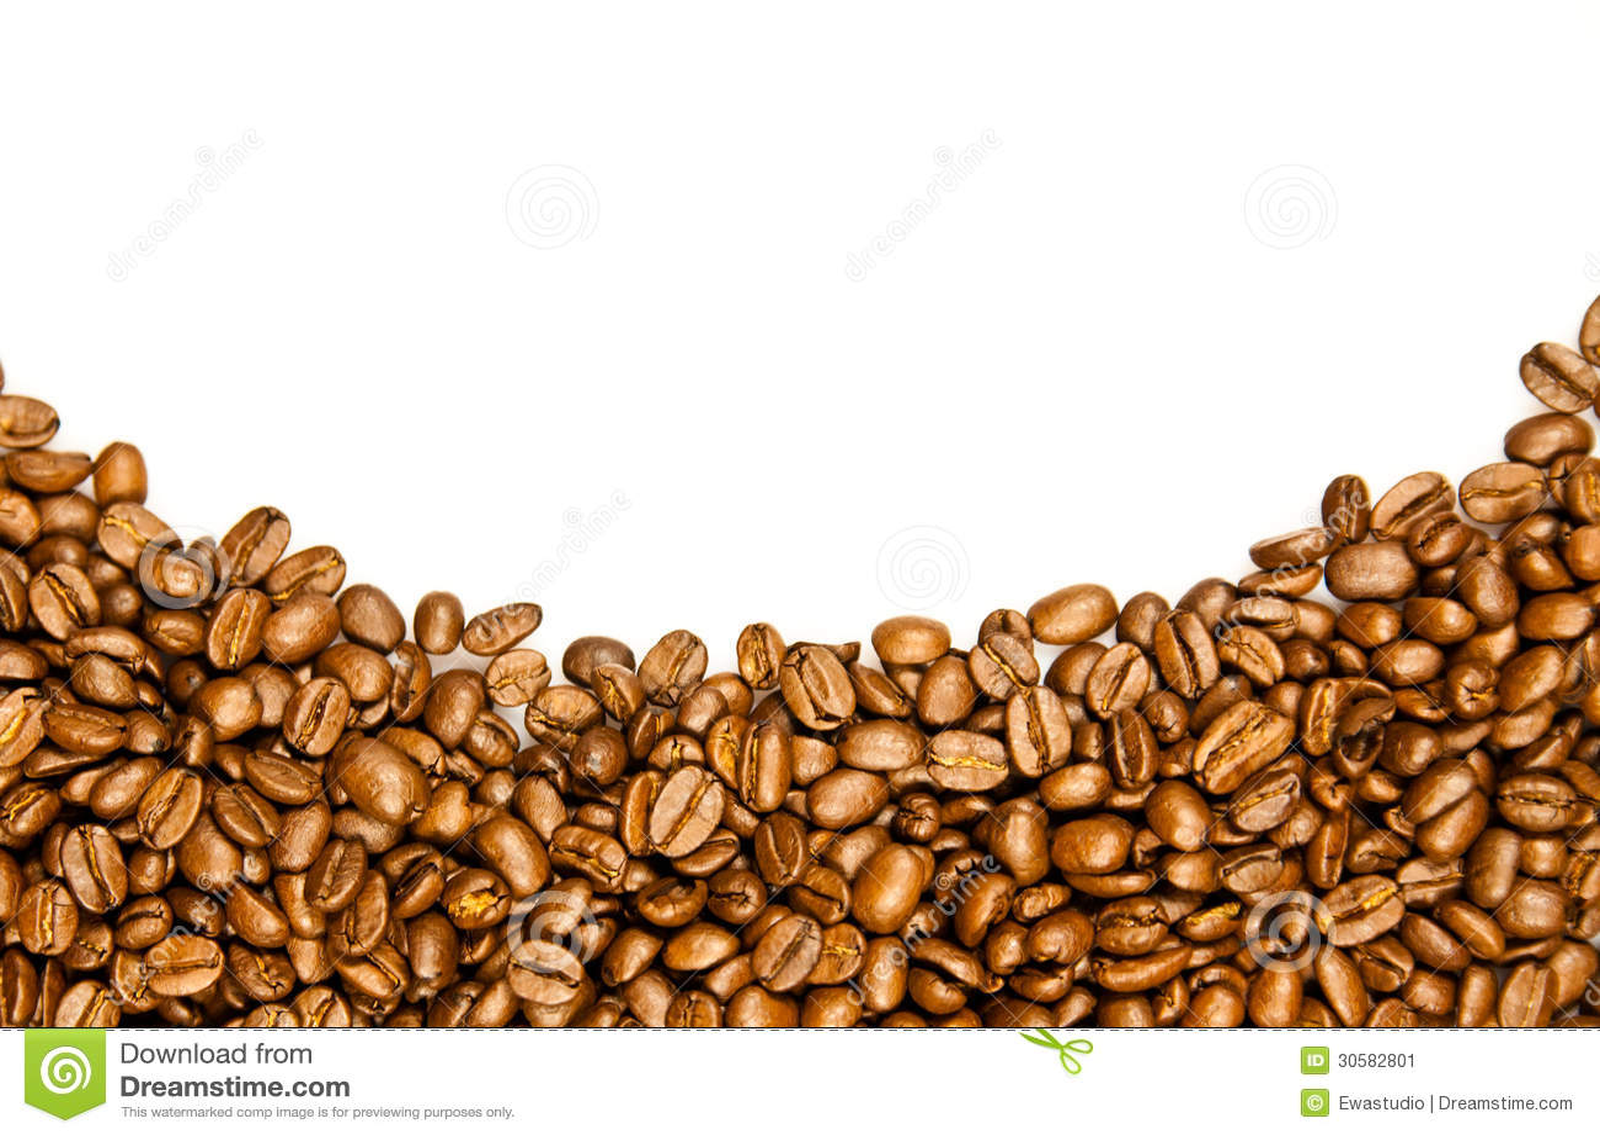 Coffee Bean Border ~ Coffee border brown beans stock image